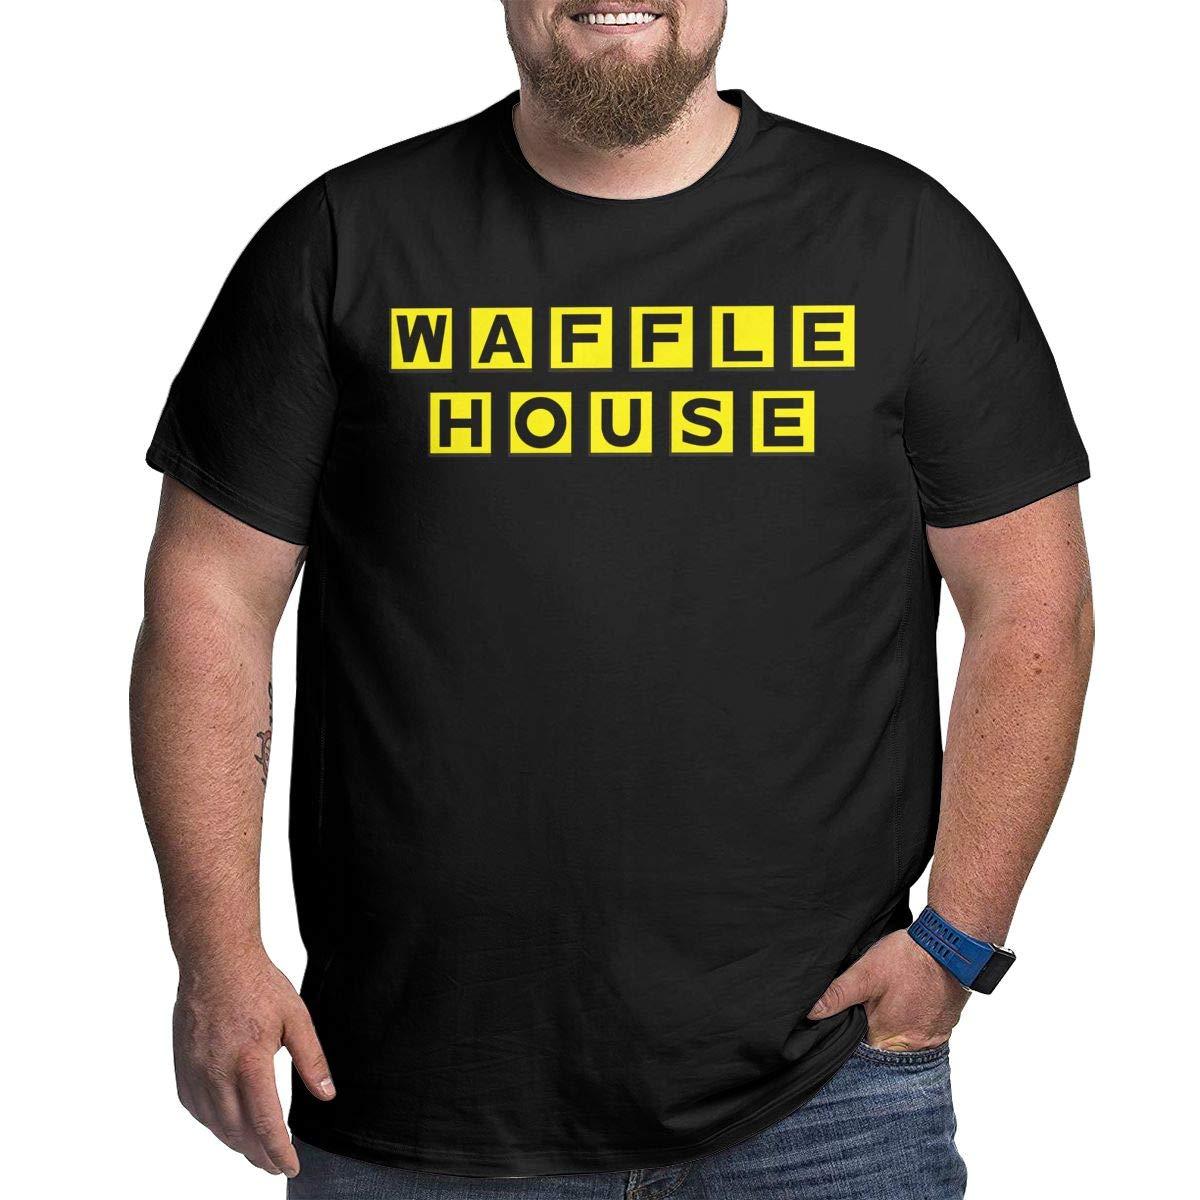 Fat Men's T Shirt Waffle House Logo Tee Shirts T-Shirt Short-Sleeve Round Neck Tshirt for Men Youth Boys Plus Size Black 4XL by BKashy